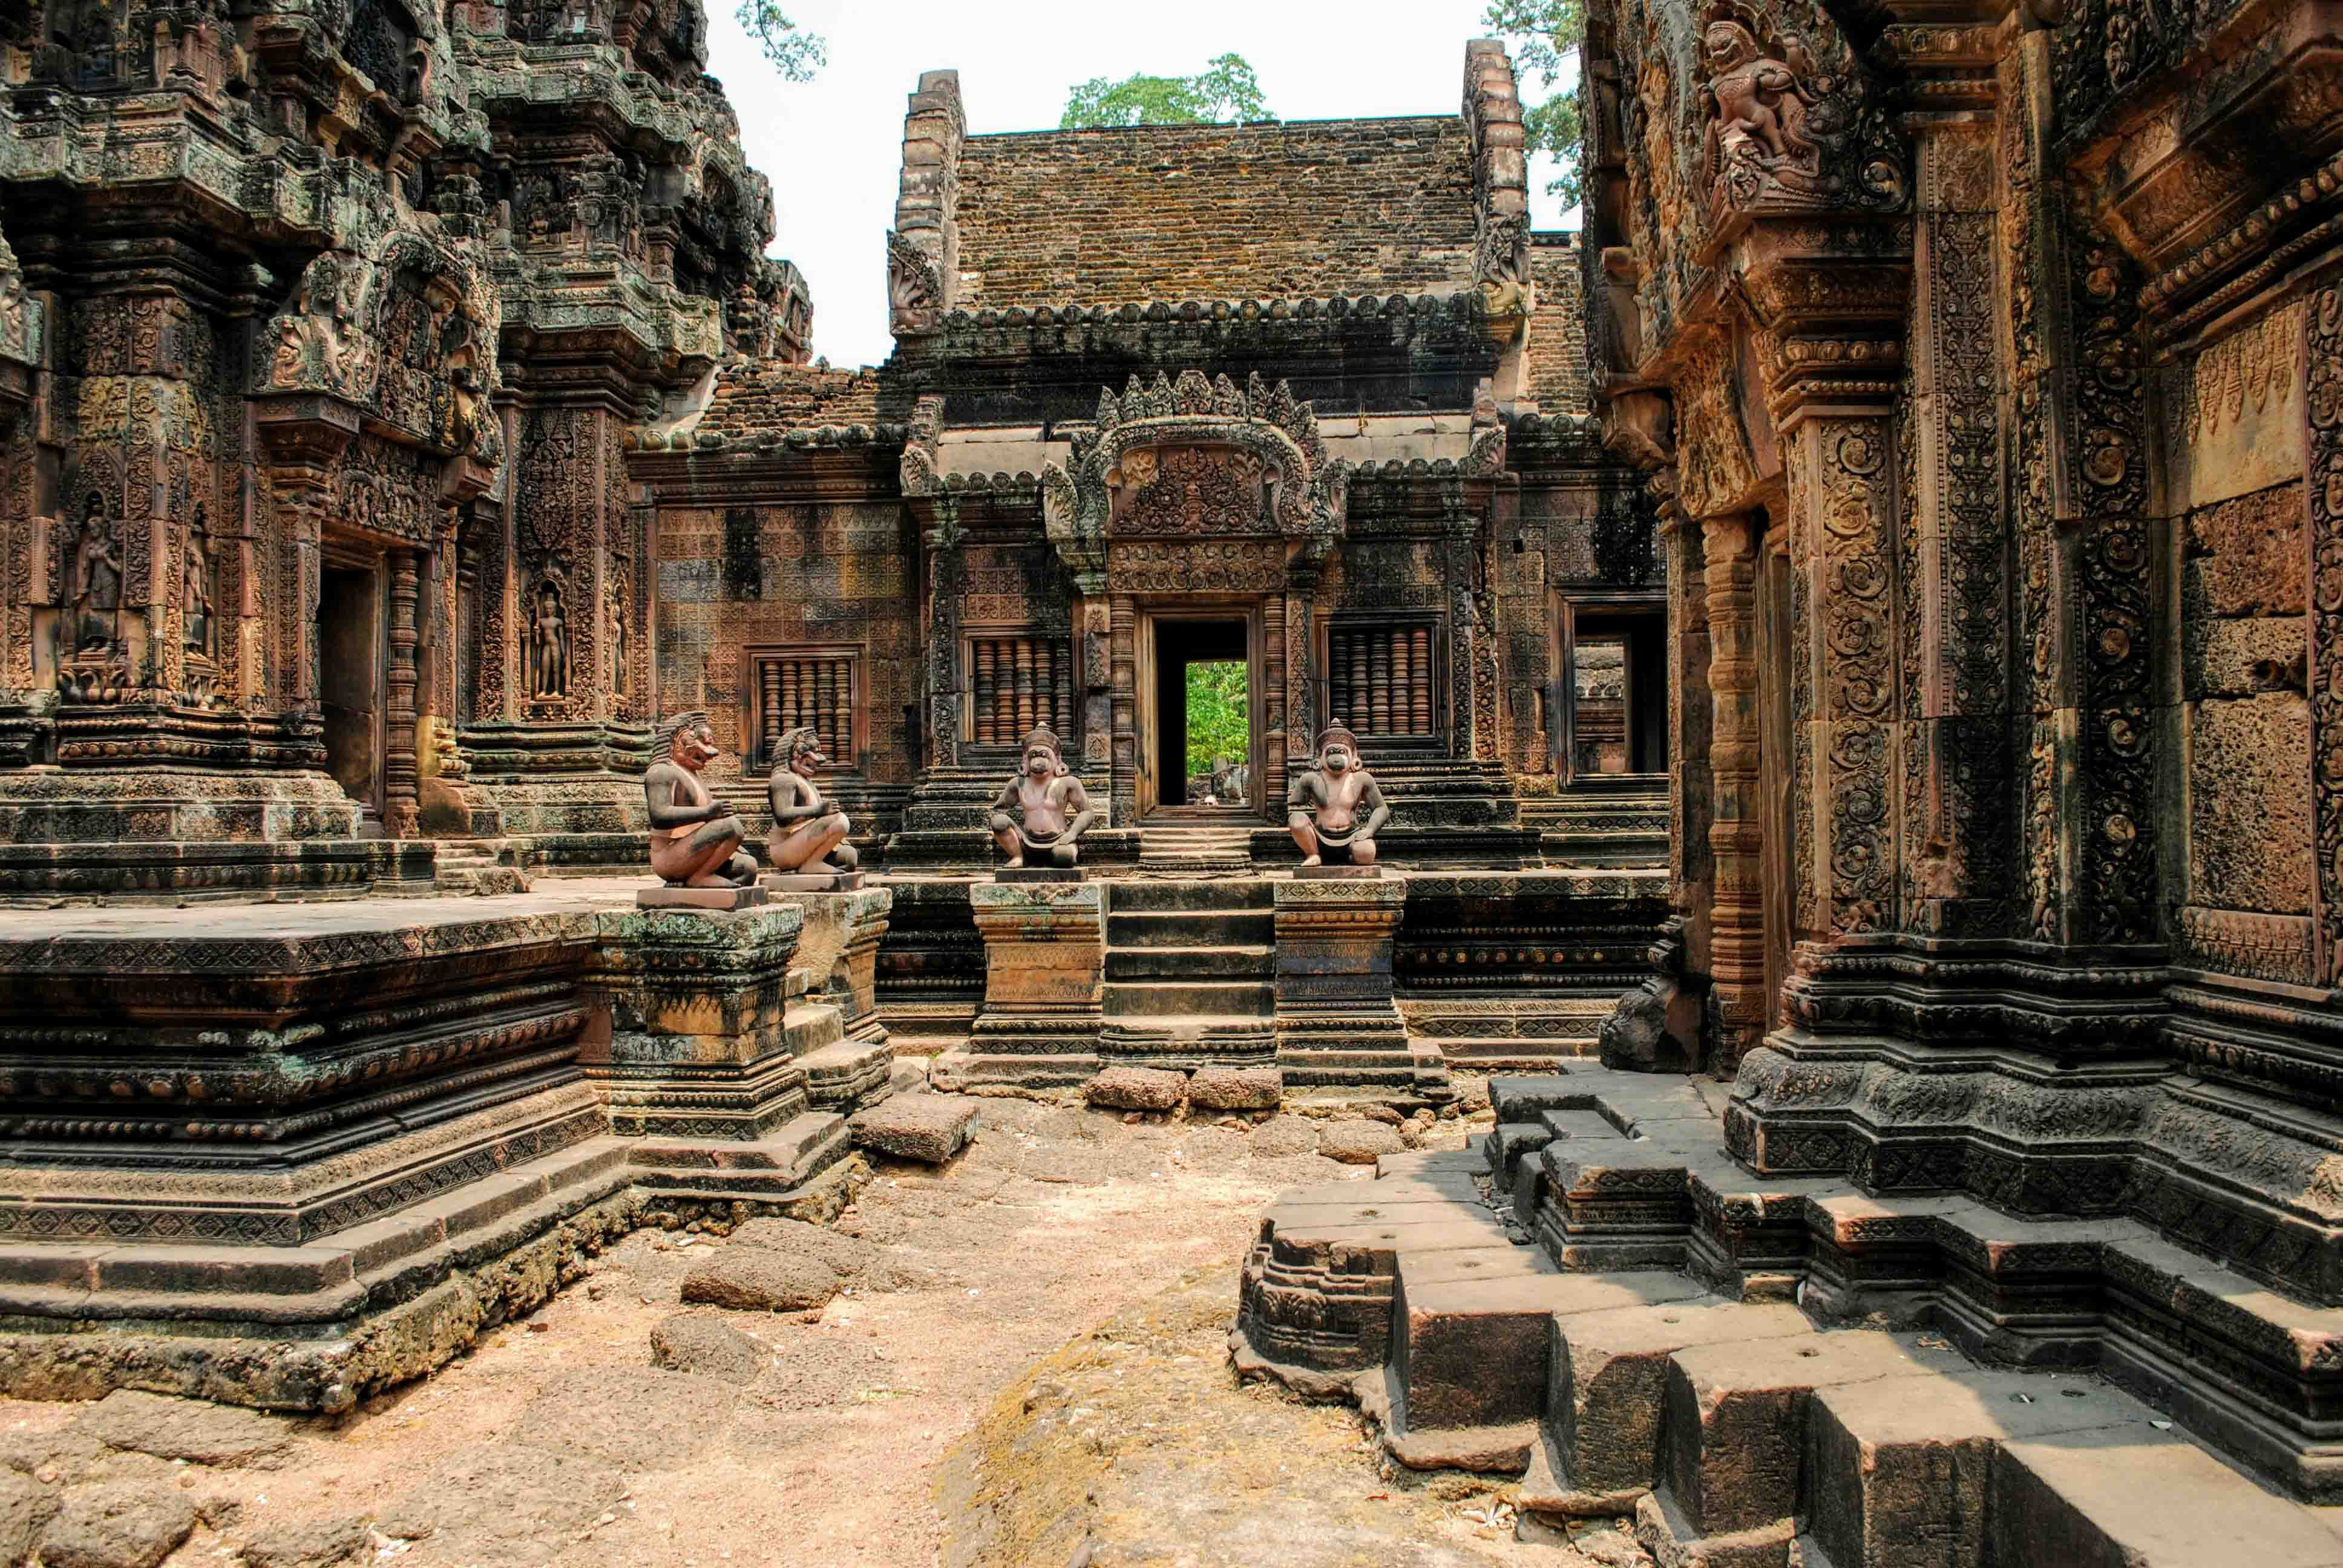 Banteay Srei by Sophie Lindsay